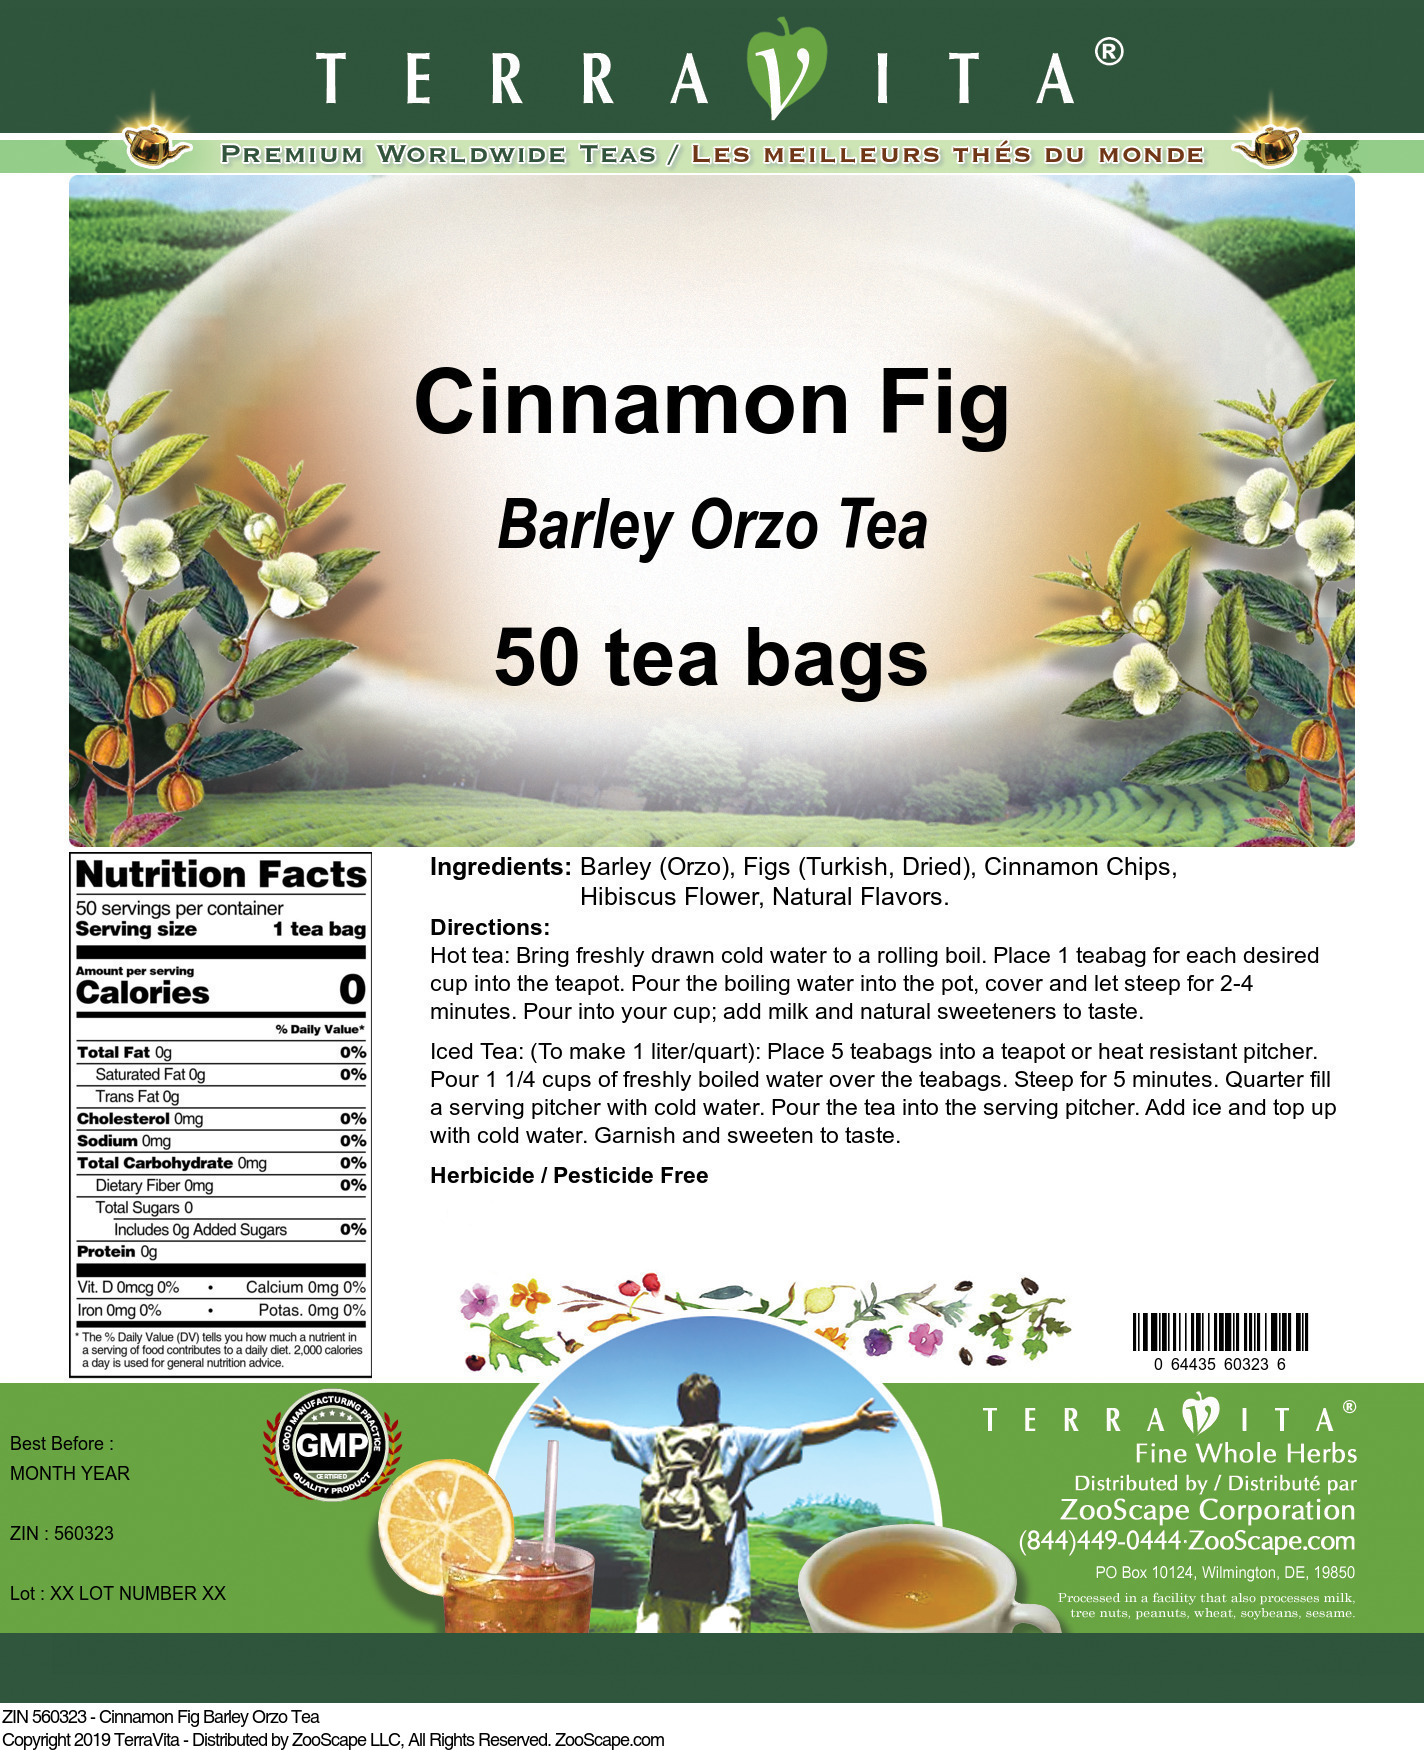 Cinnamon Fig Barley Orzo